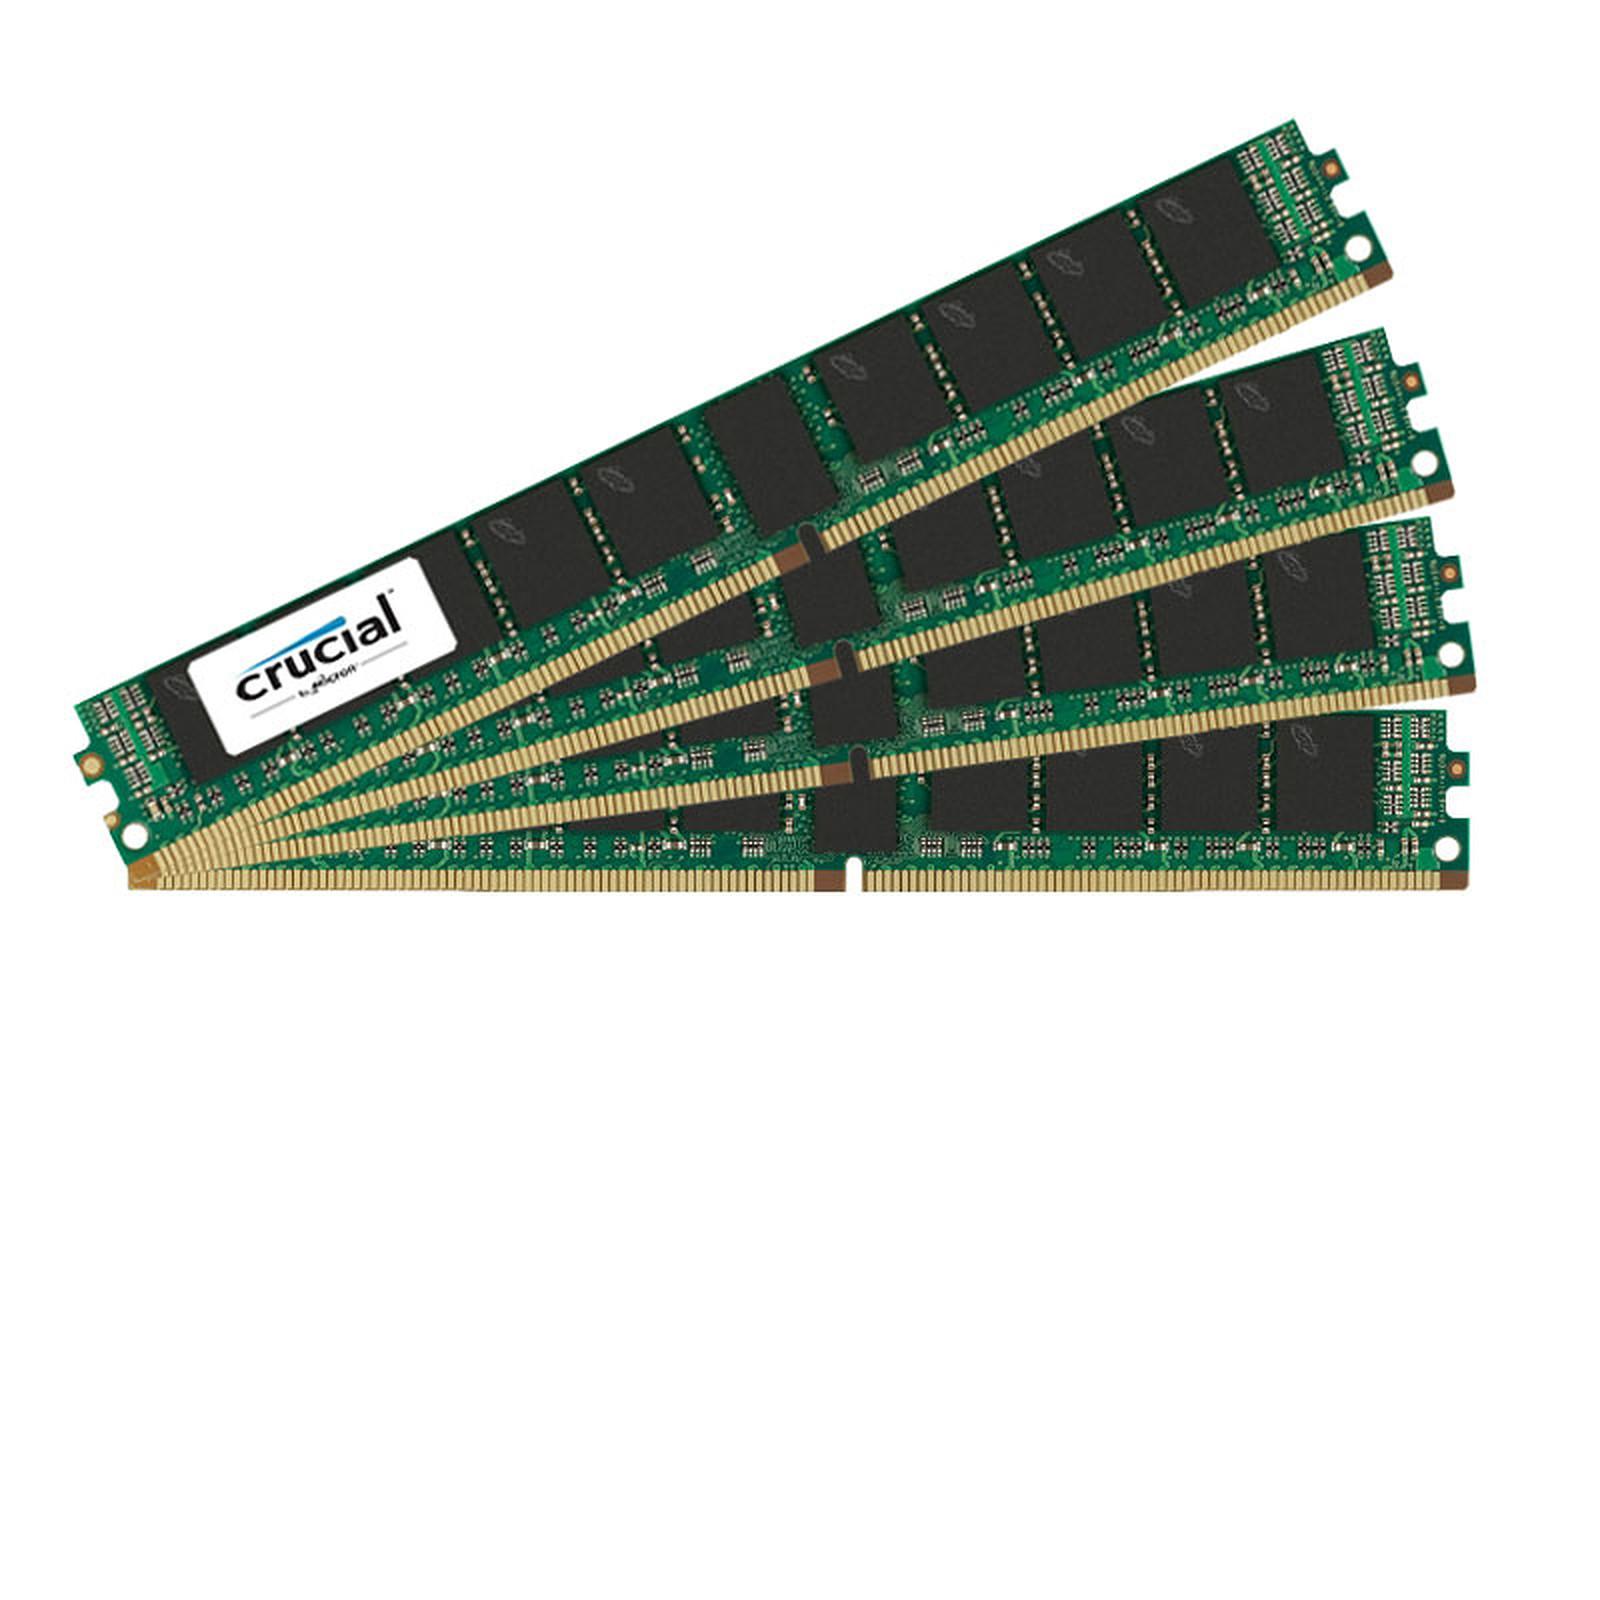 Crucial DDR4 128 GB (4 x 32 GB) 2400 MHz CL17 ECC Registered DR X4 VLP